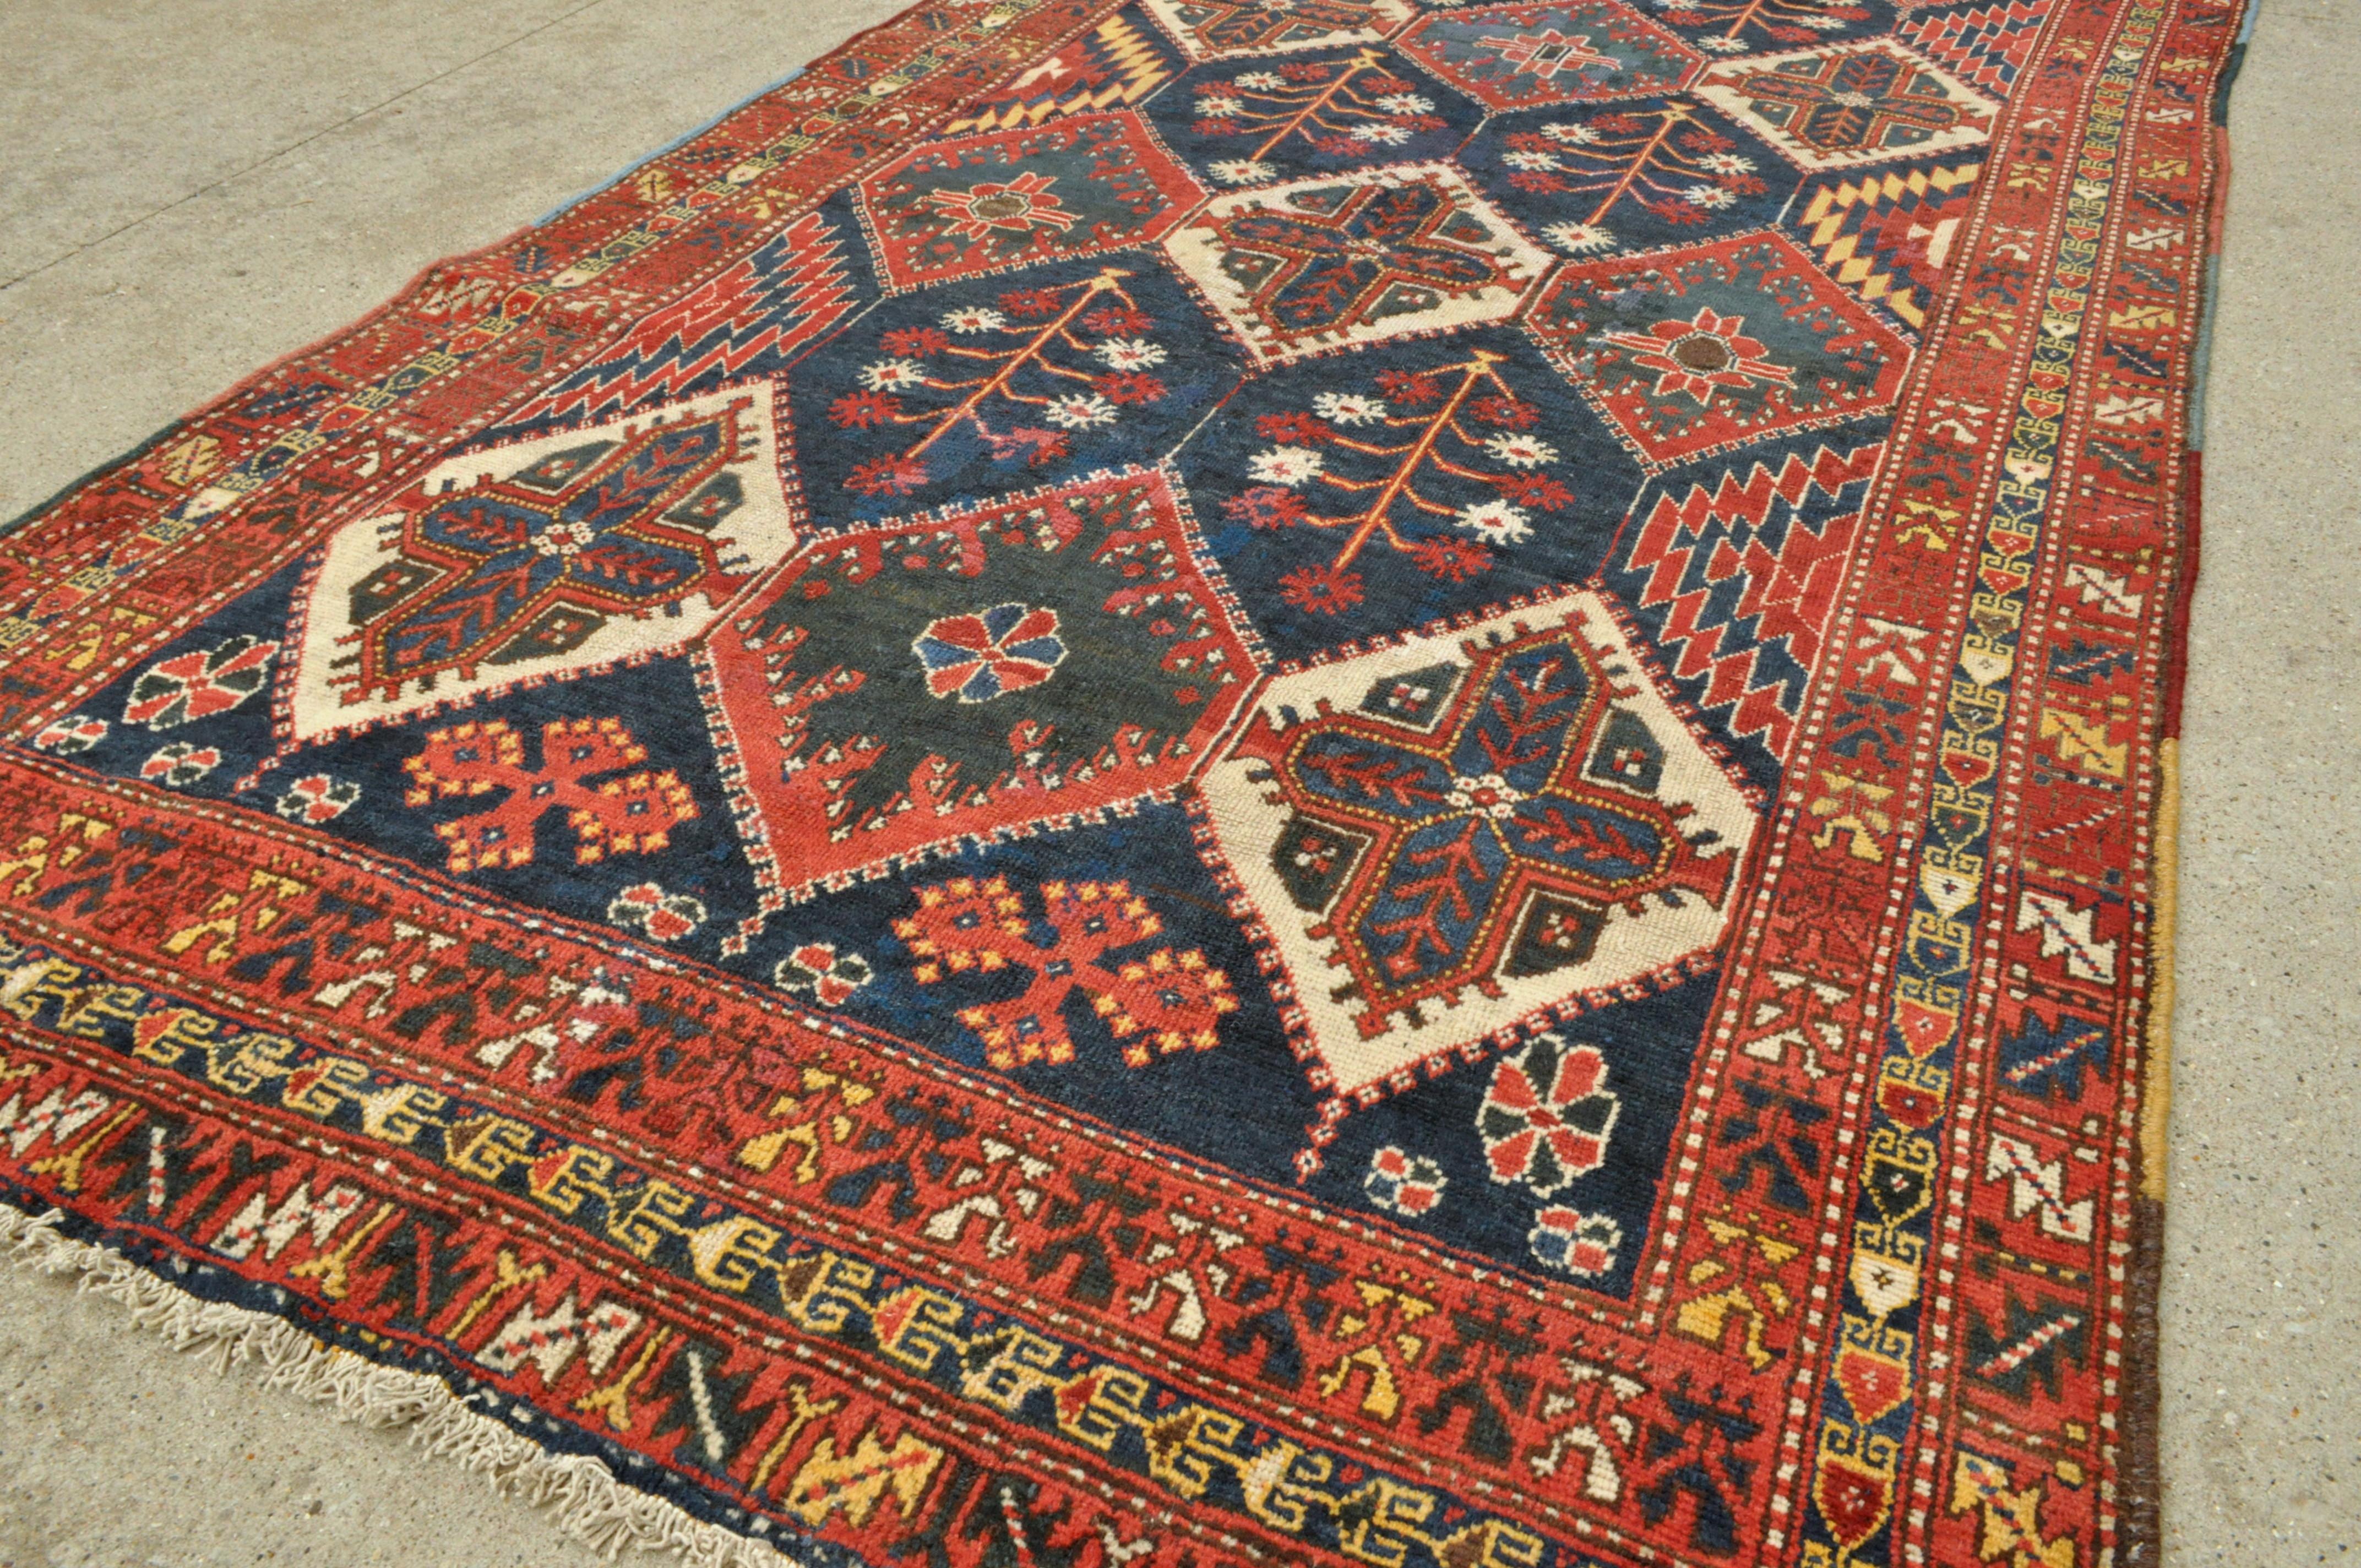 Antique Bakhtiari Tribal Persian Rug 5 0 X 9 5 150 X 286 Cm